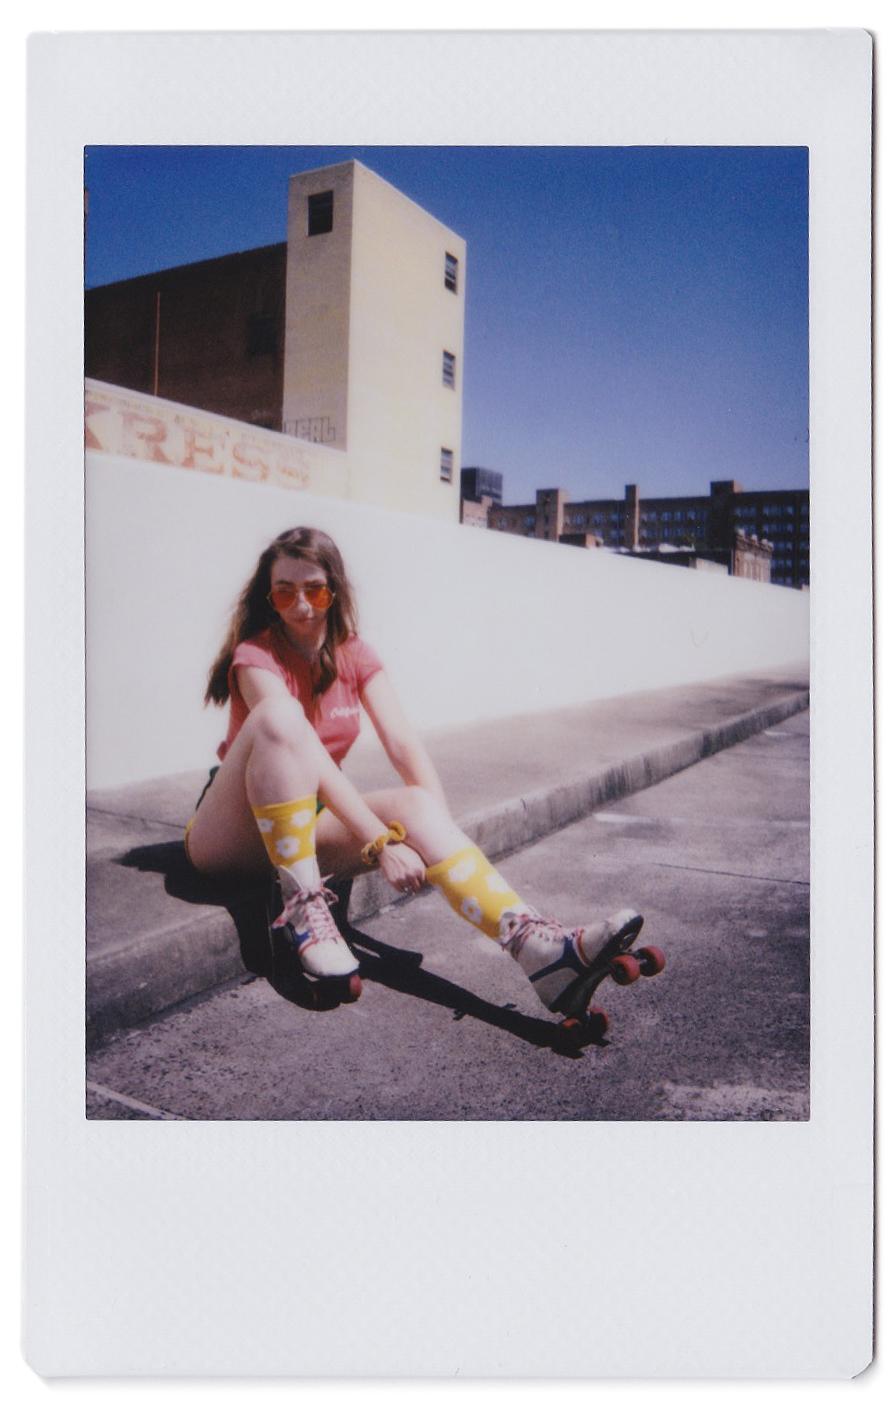 vintage polaroid scan of girl wearing roller skates